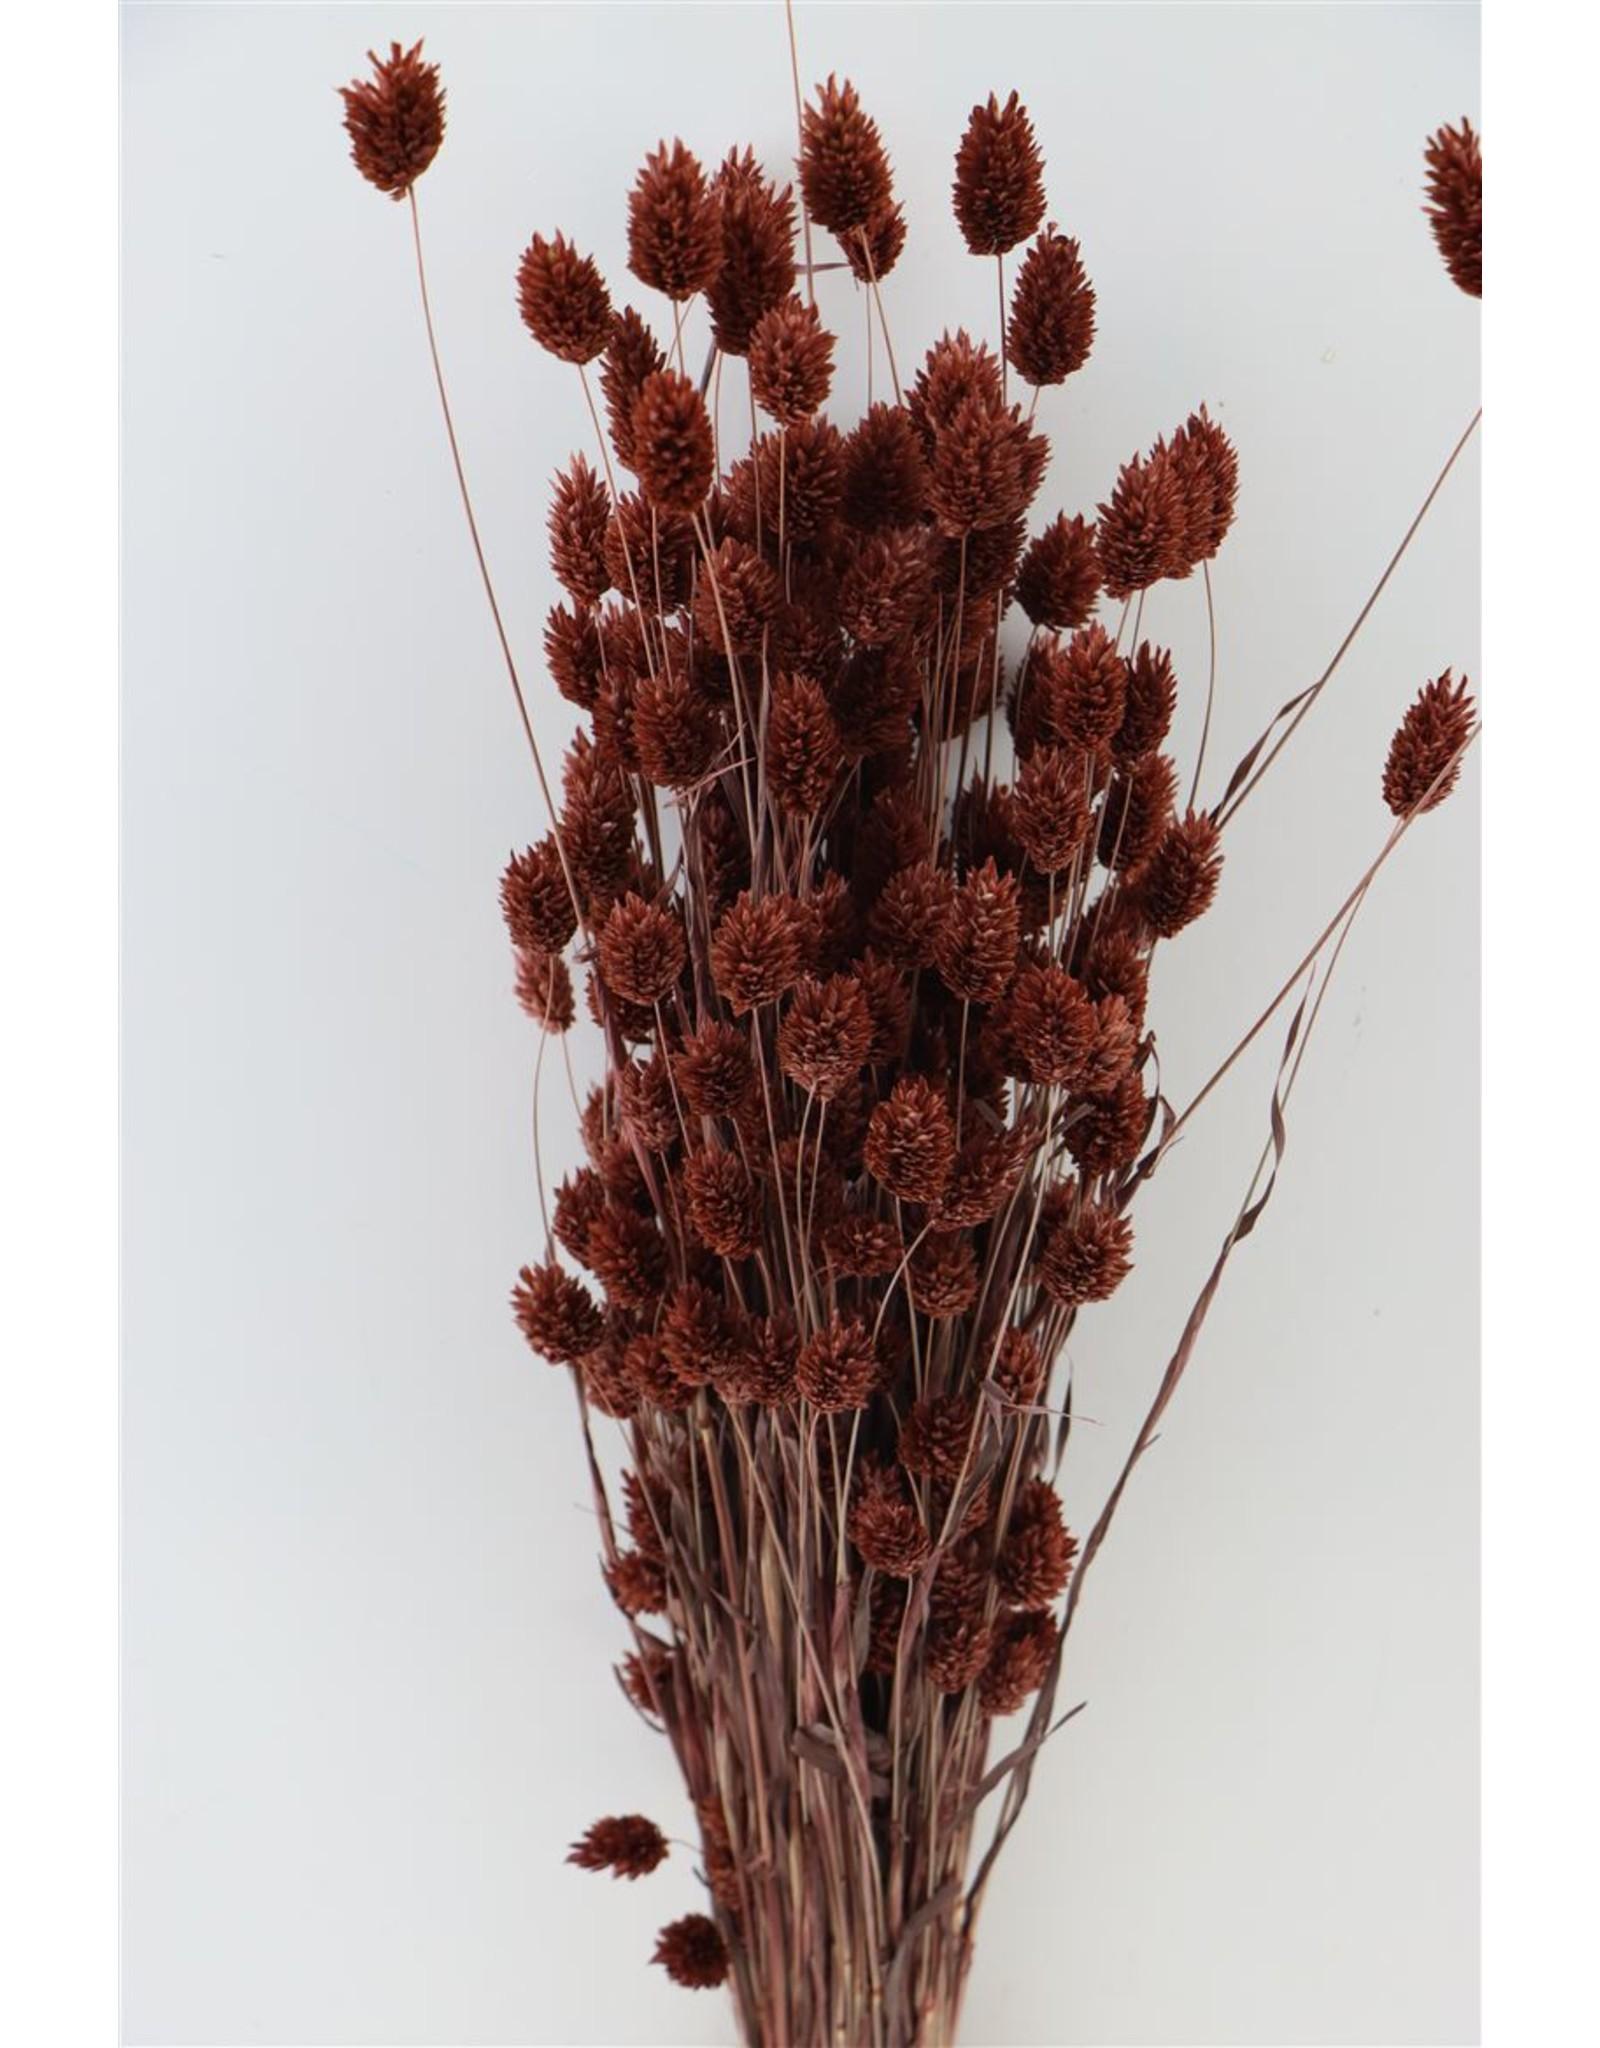 GF Dried Phalaris D. Brown Bunch x 5